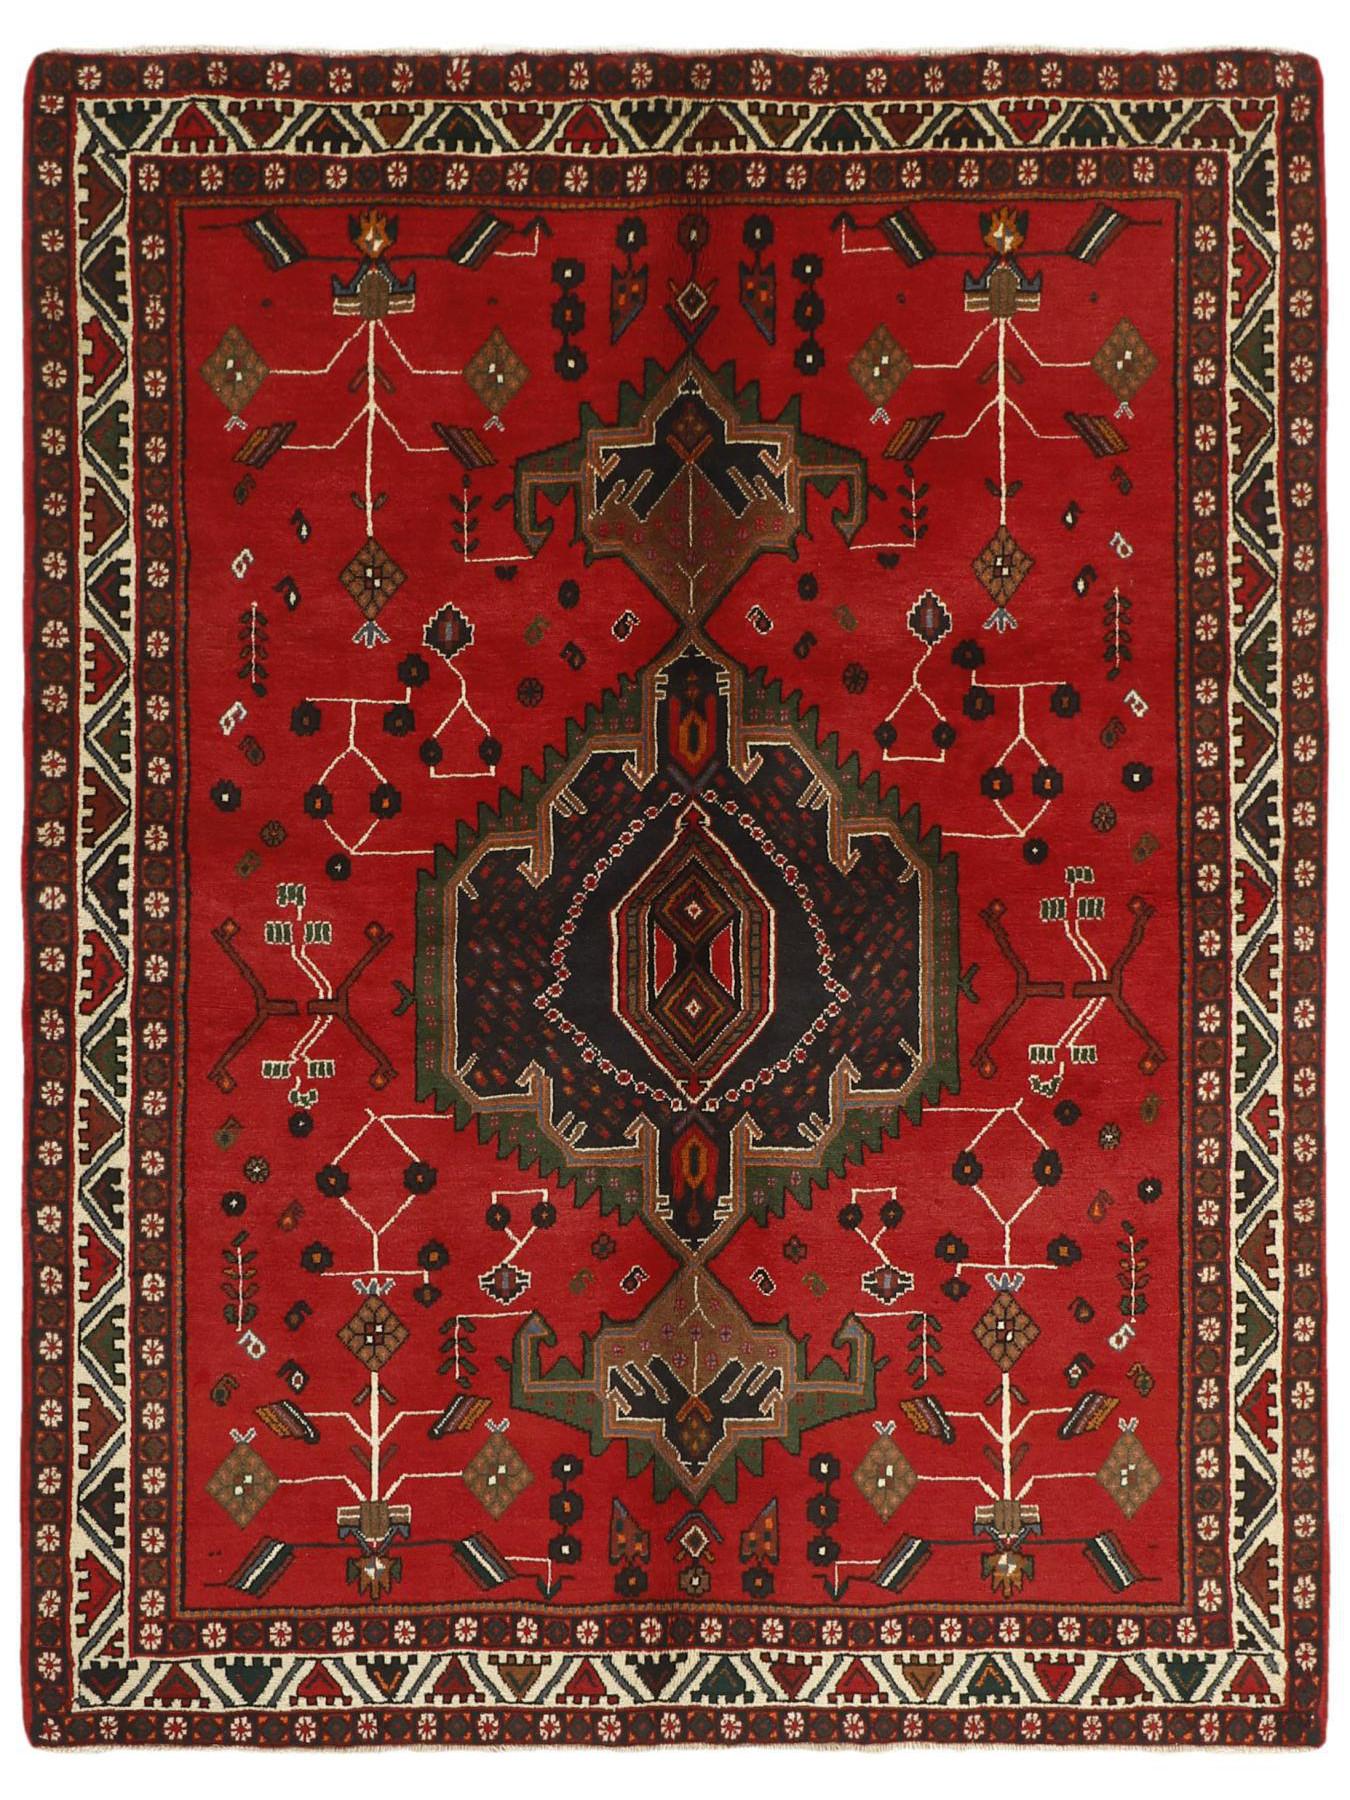 Perzische tapijten - Afshar